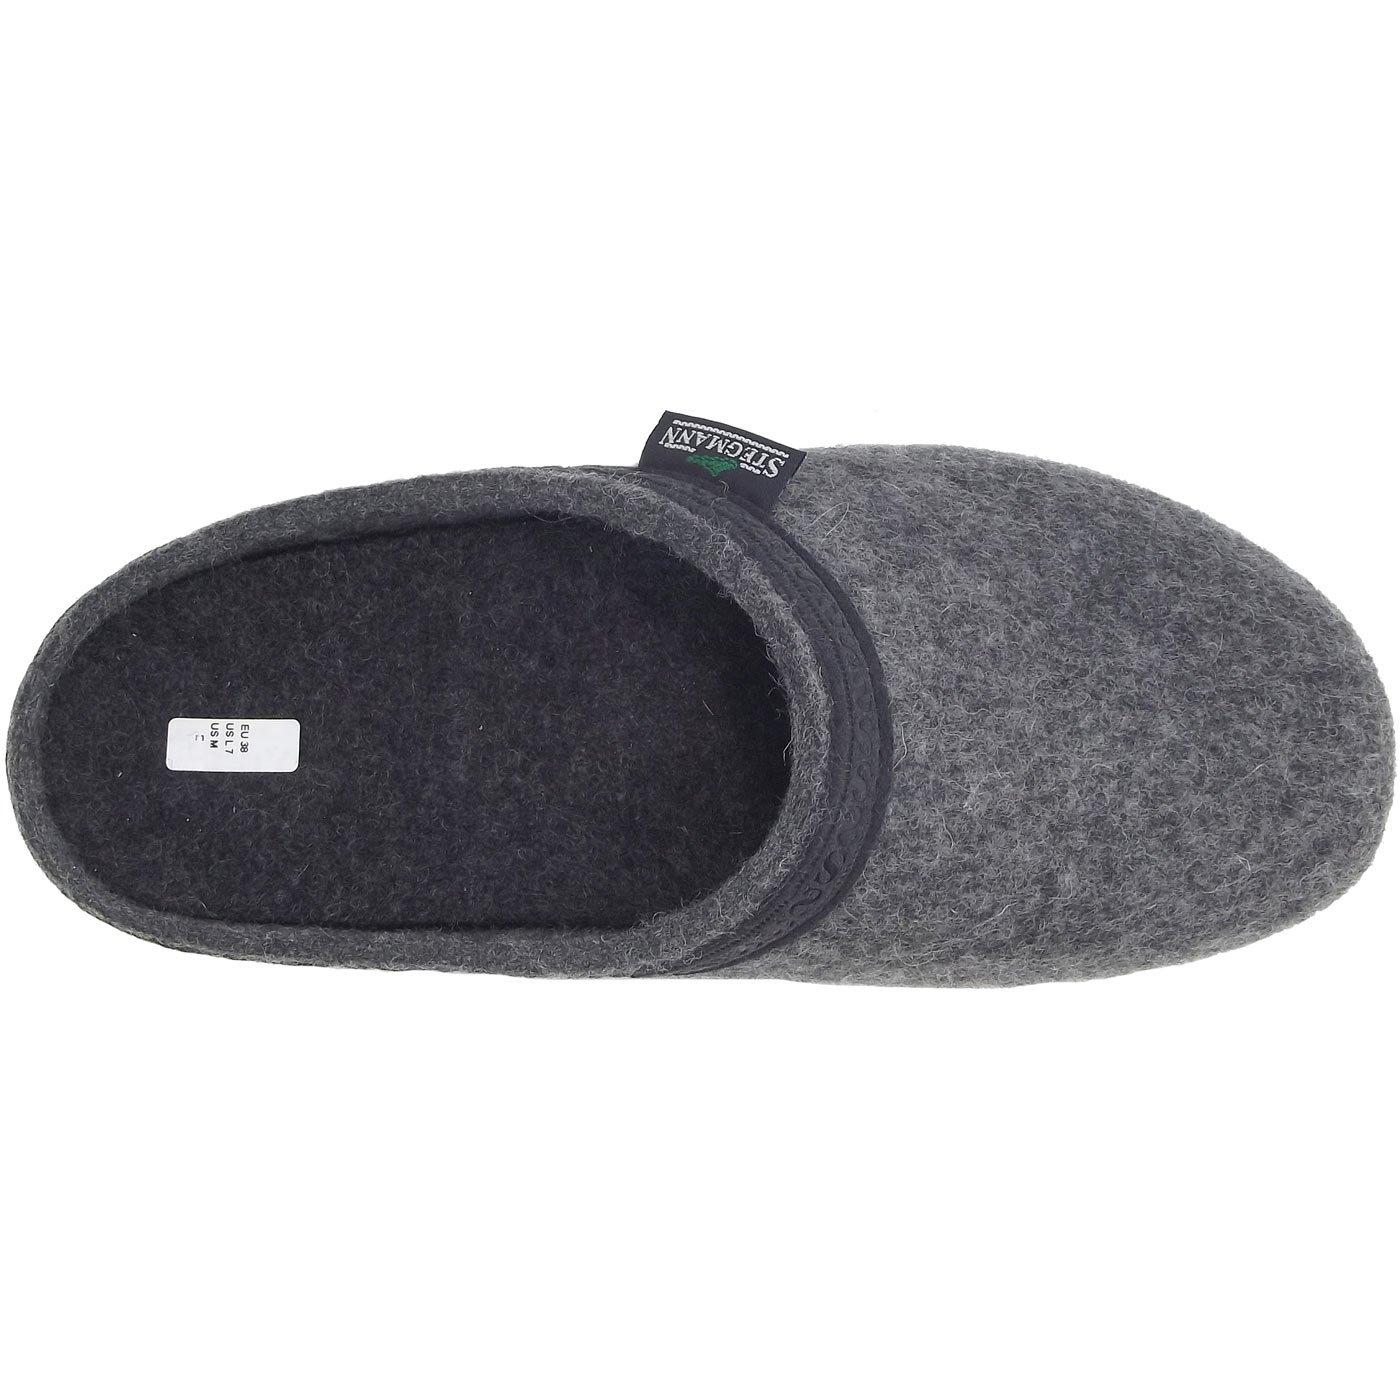 Chaussures Stegmann grises unisexe ldYMRS0I